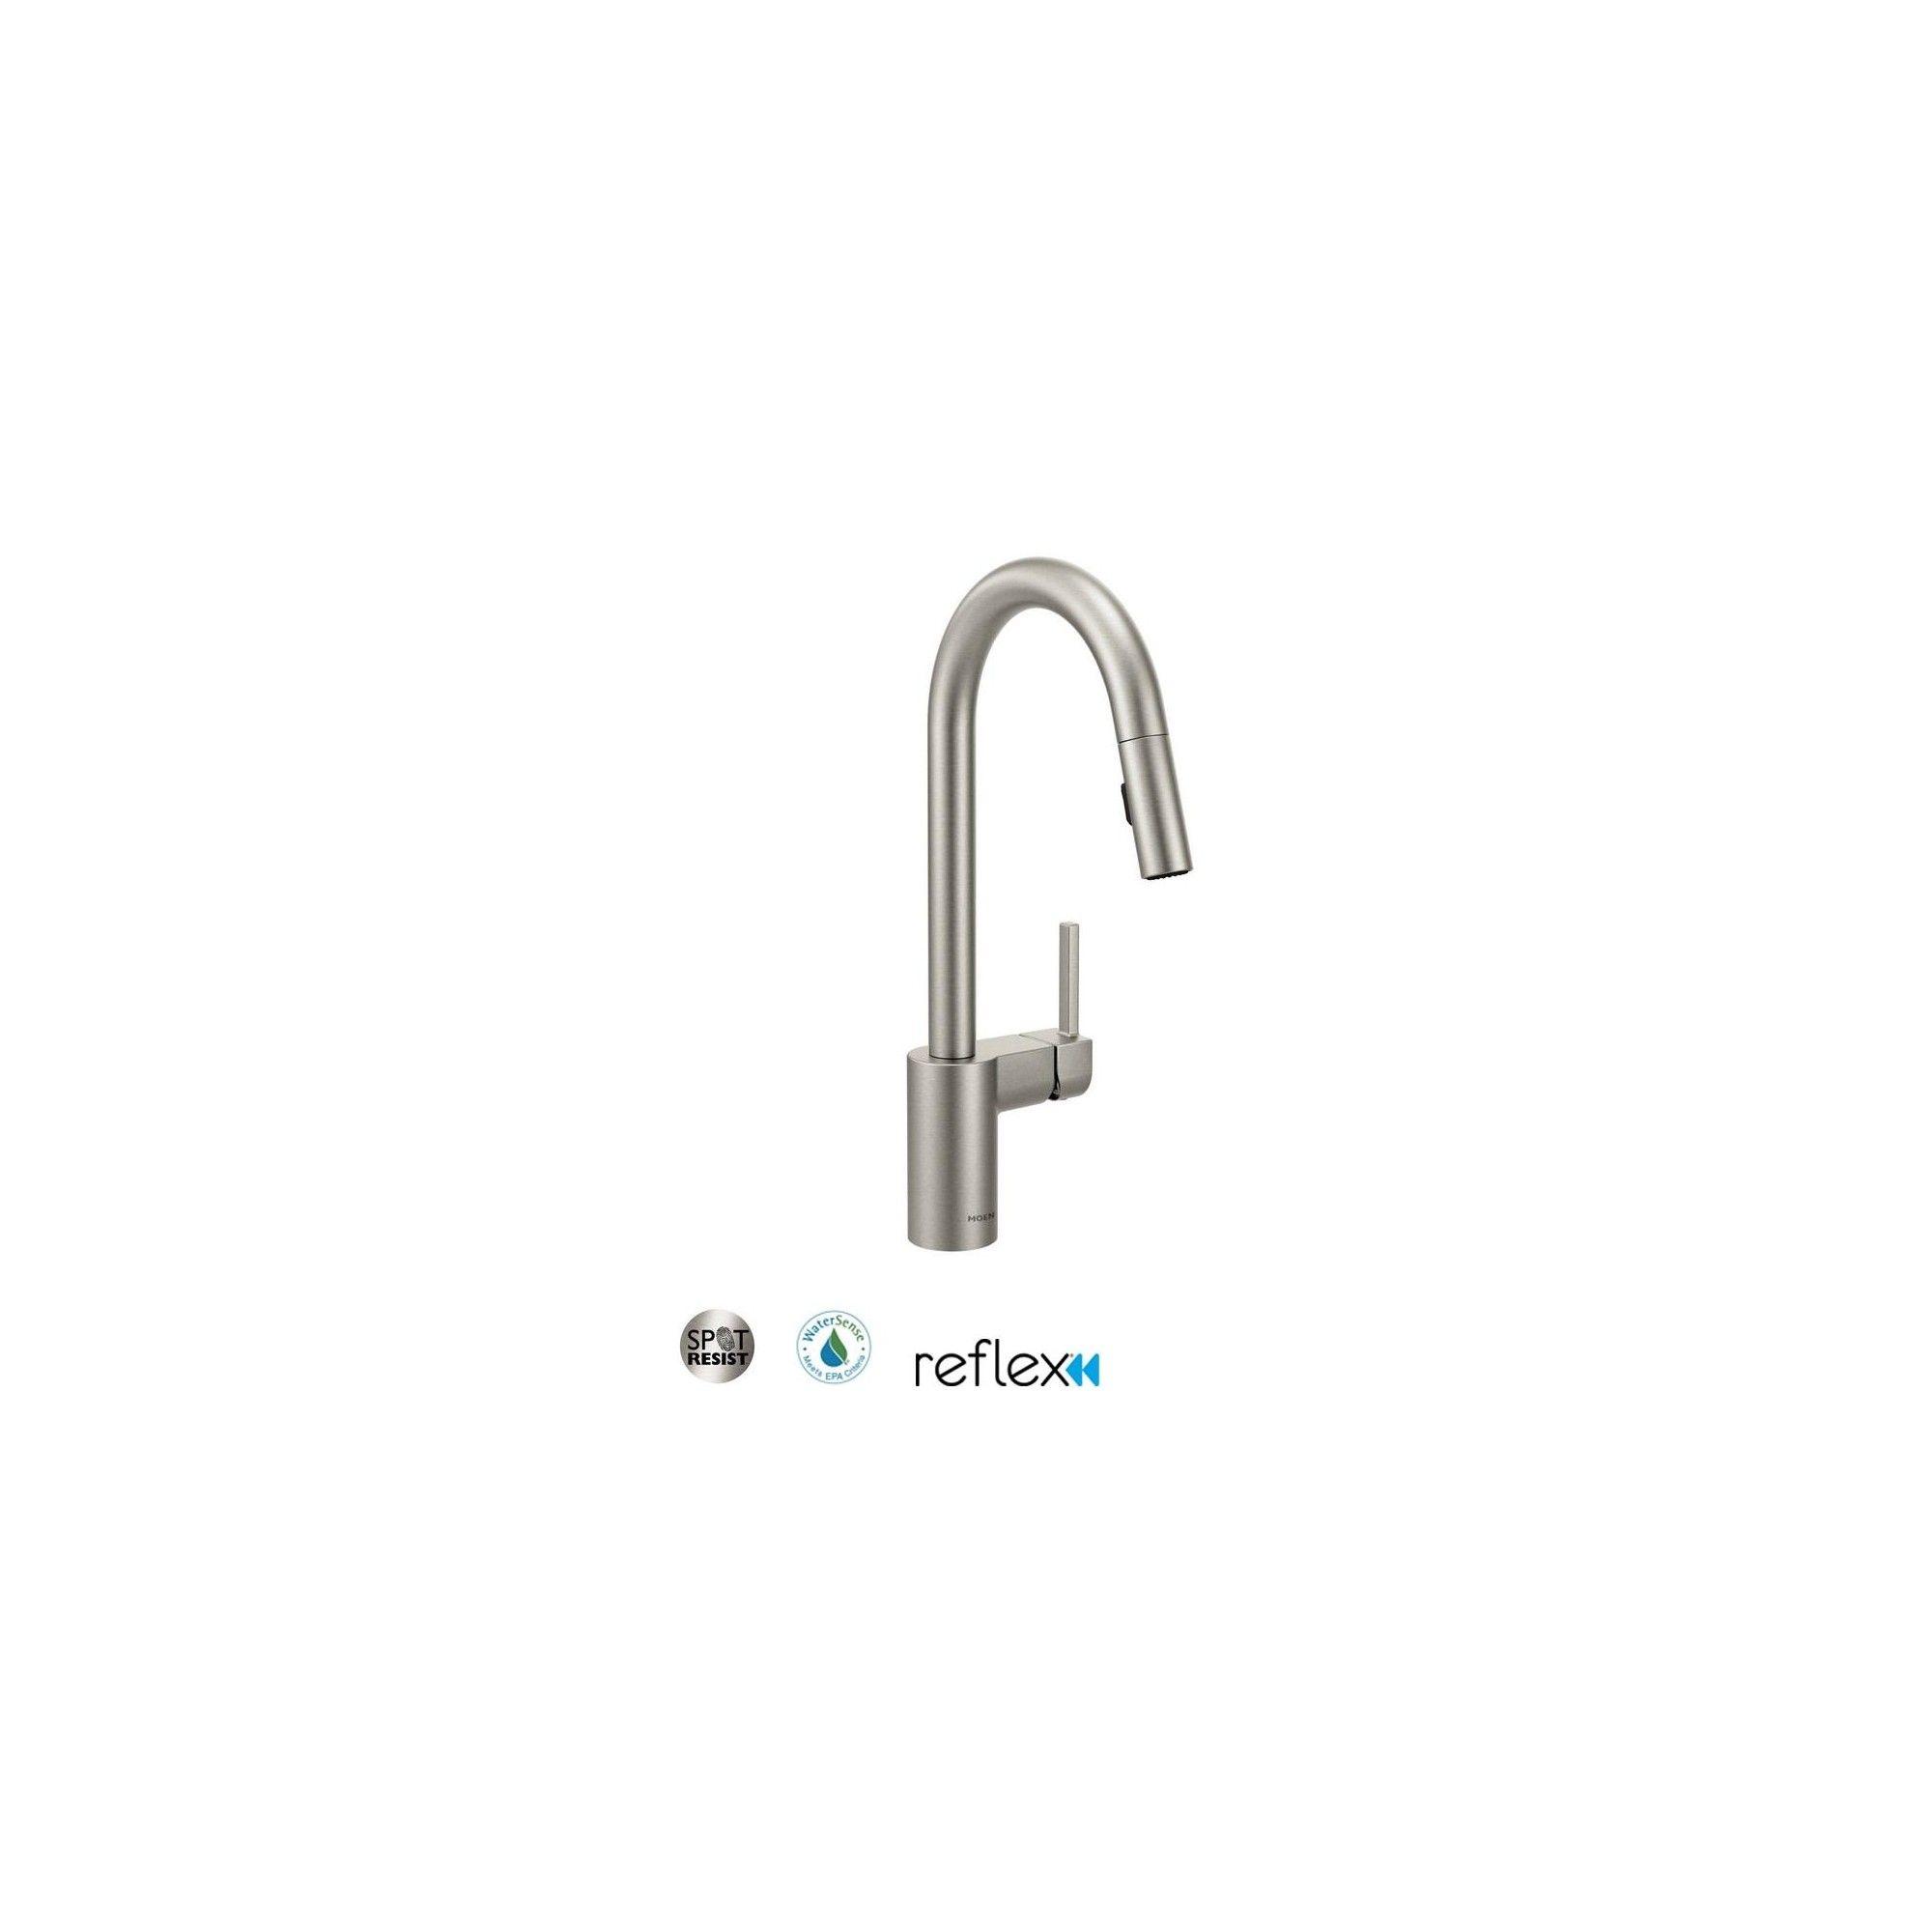 Moen 7565 Align Pull Down Spray Kitchen Faucet Spot Resist